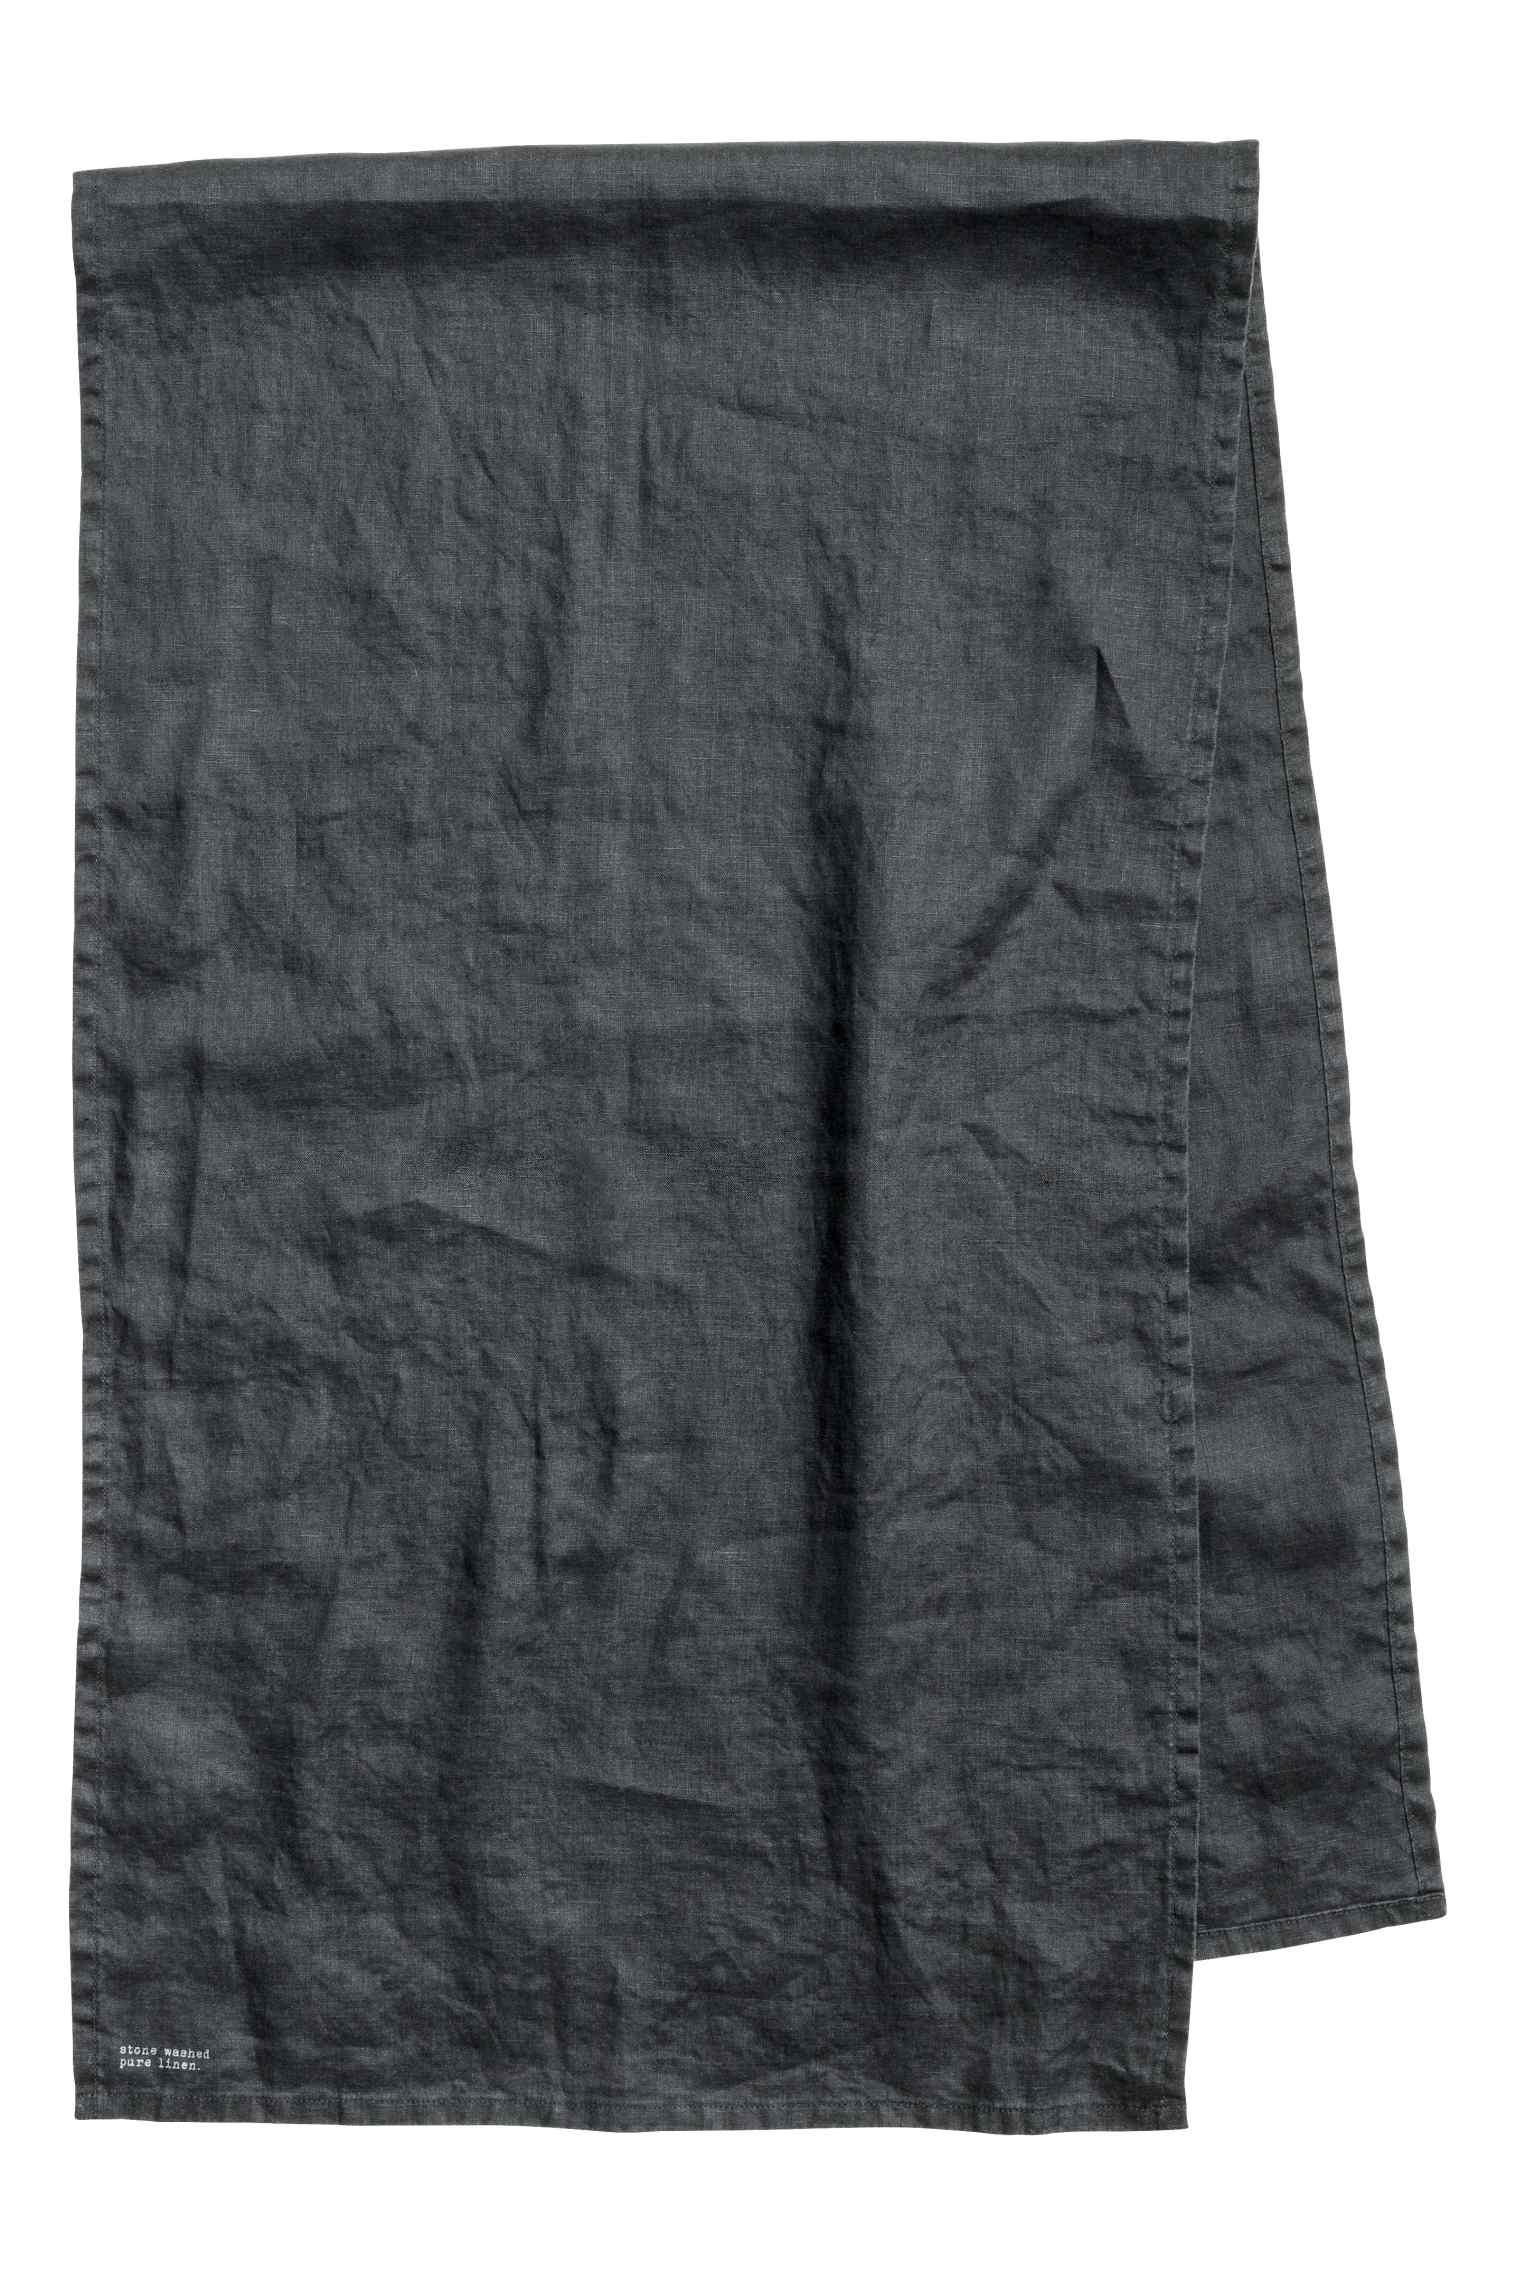 Washed linen runner, $15